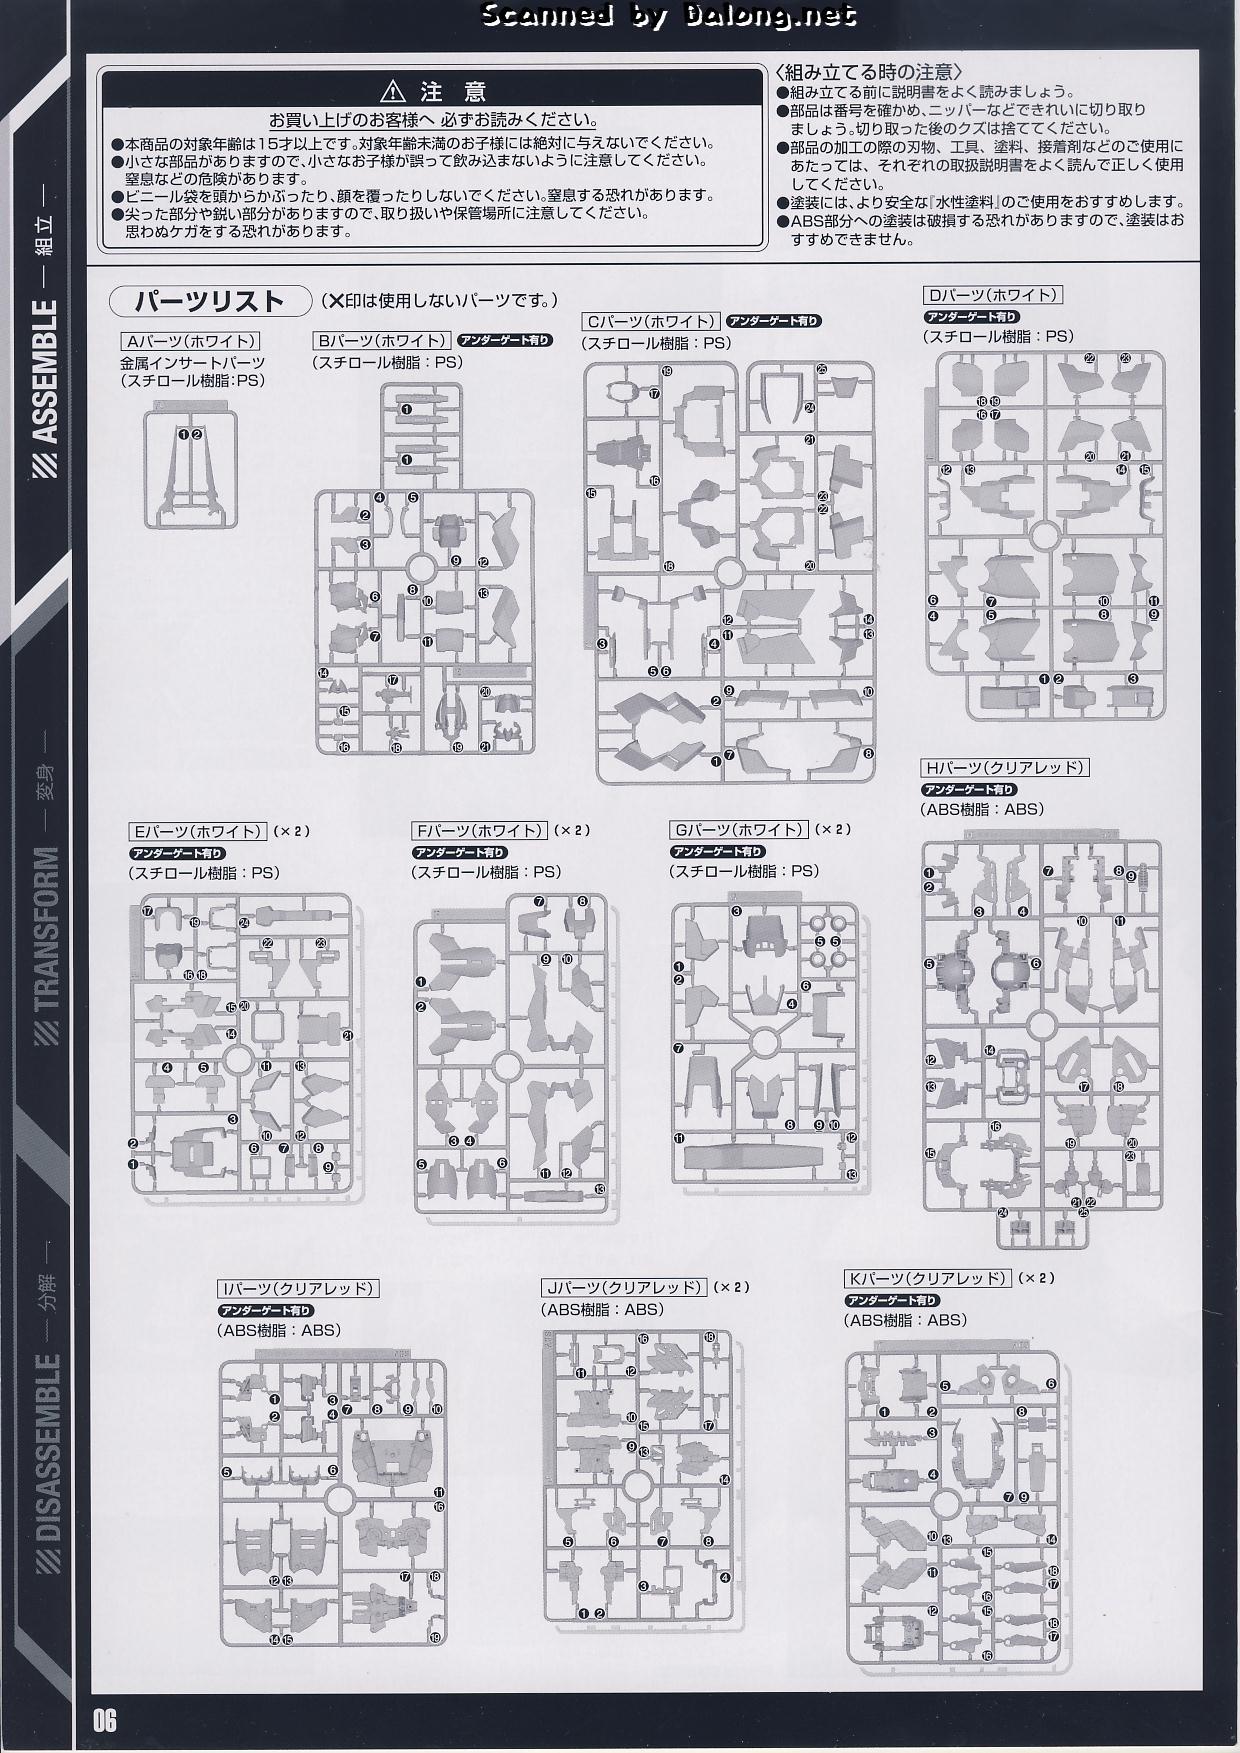 PG15独角兽高达说明6.JPG